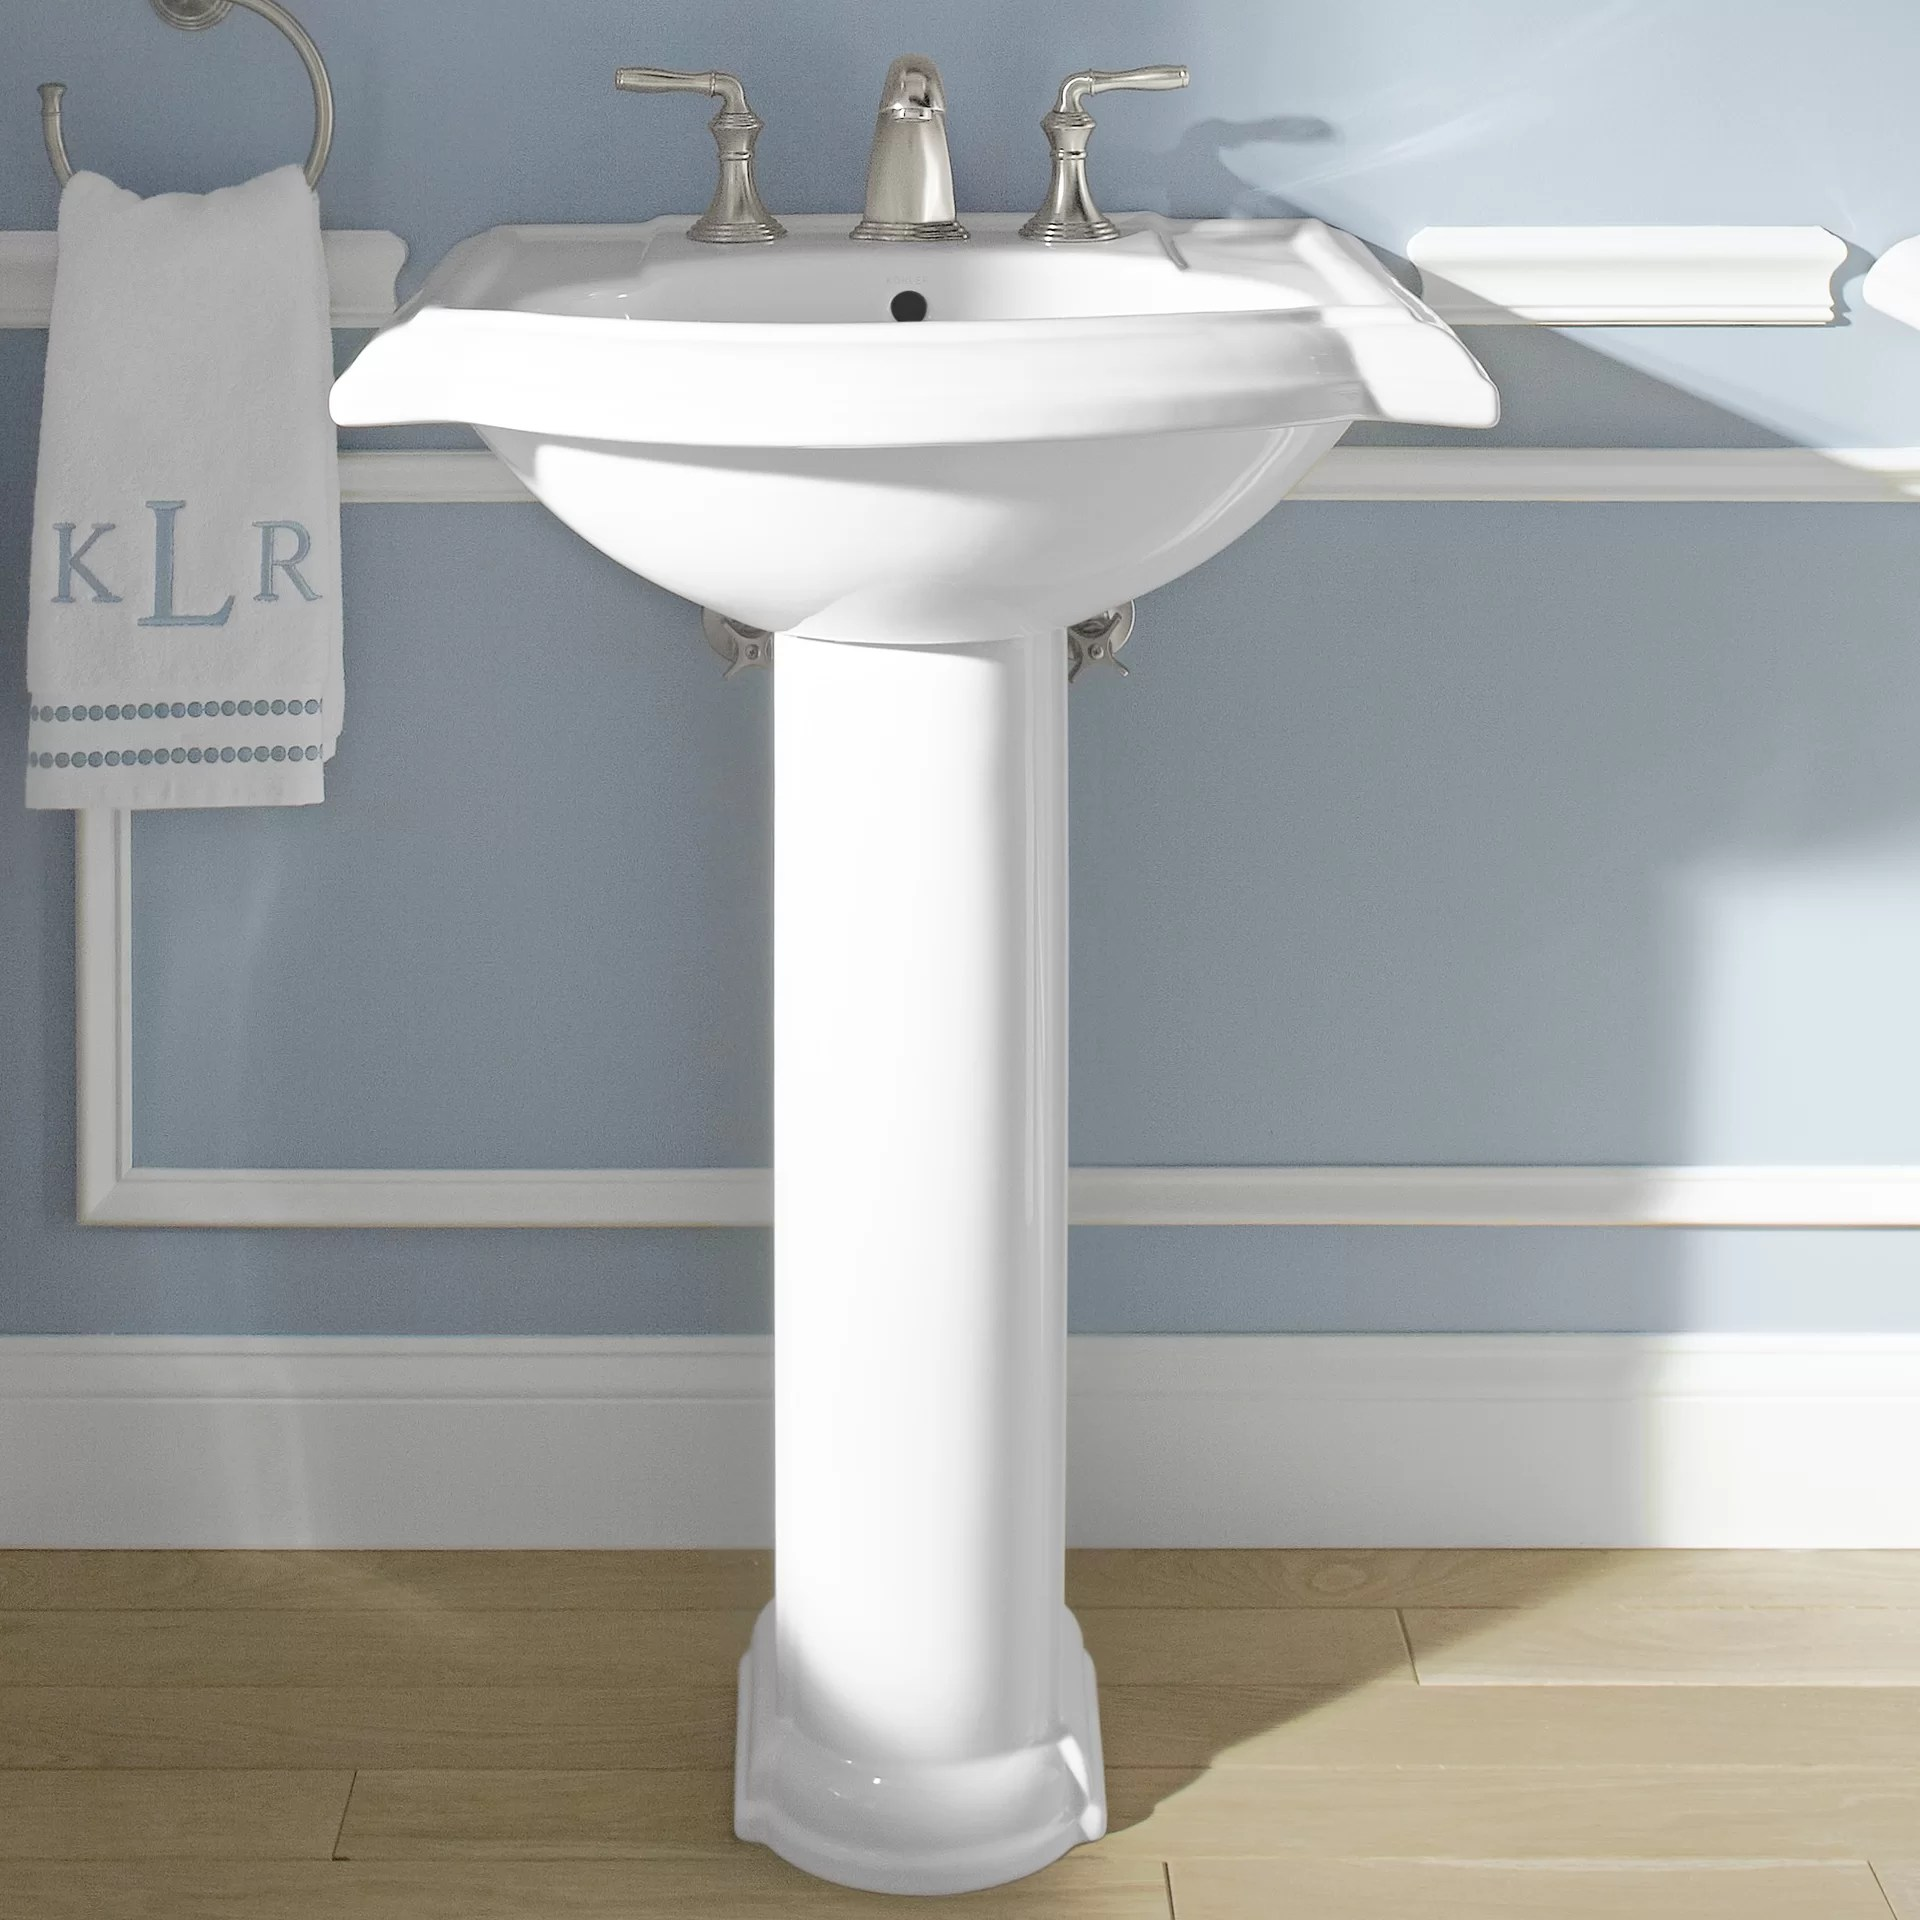 Kohler Devonshire Bathroom Sink with Single Faucet Hole